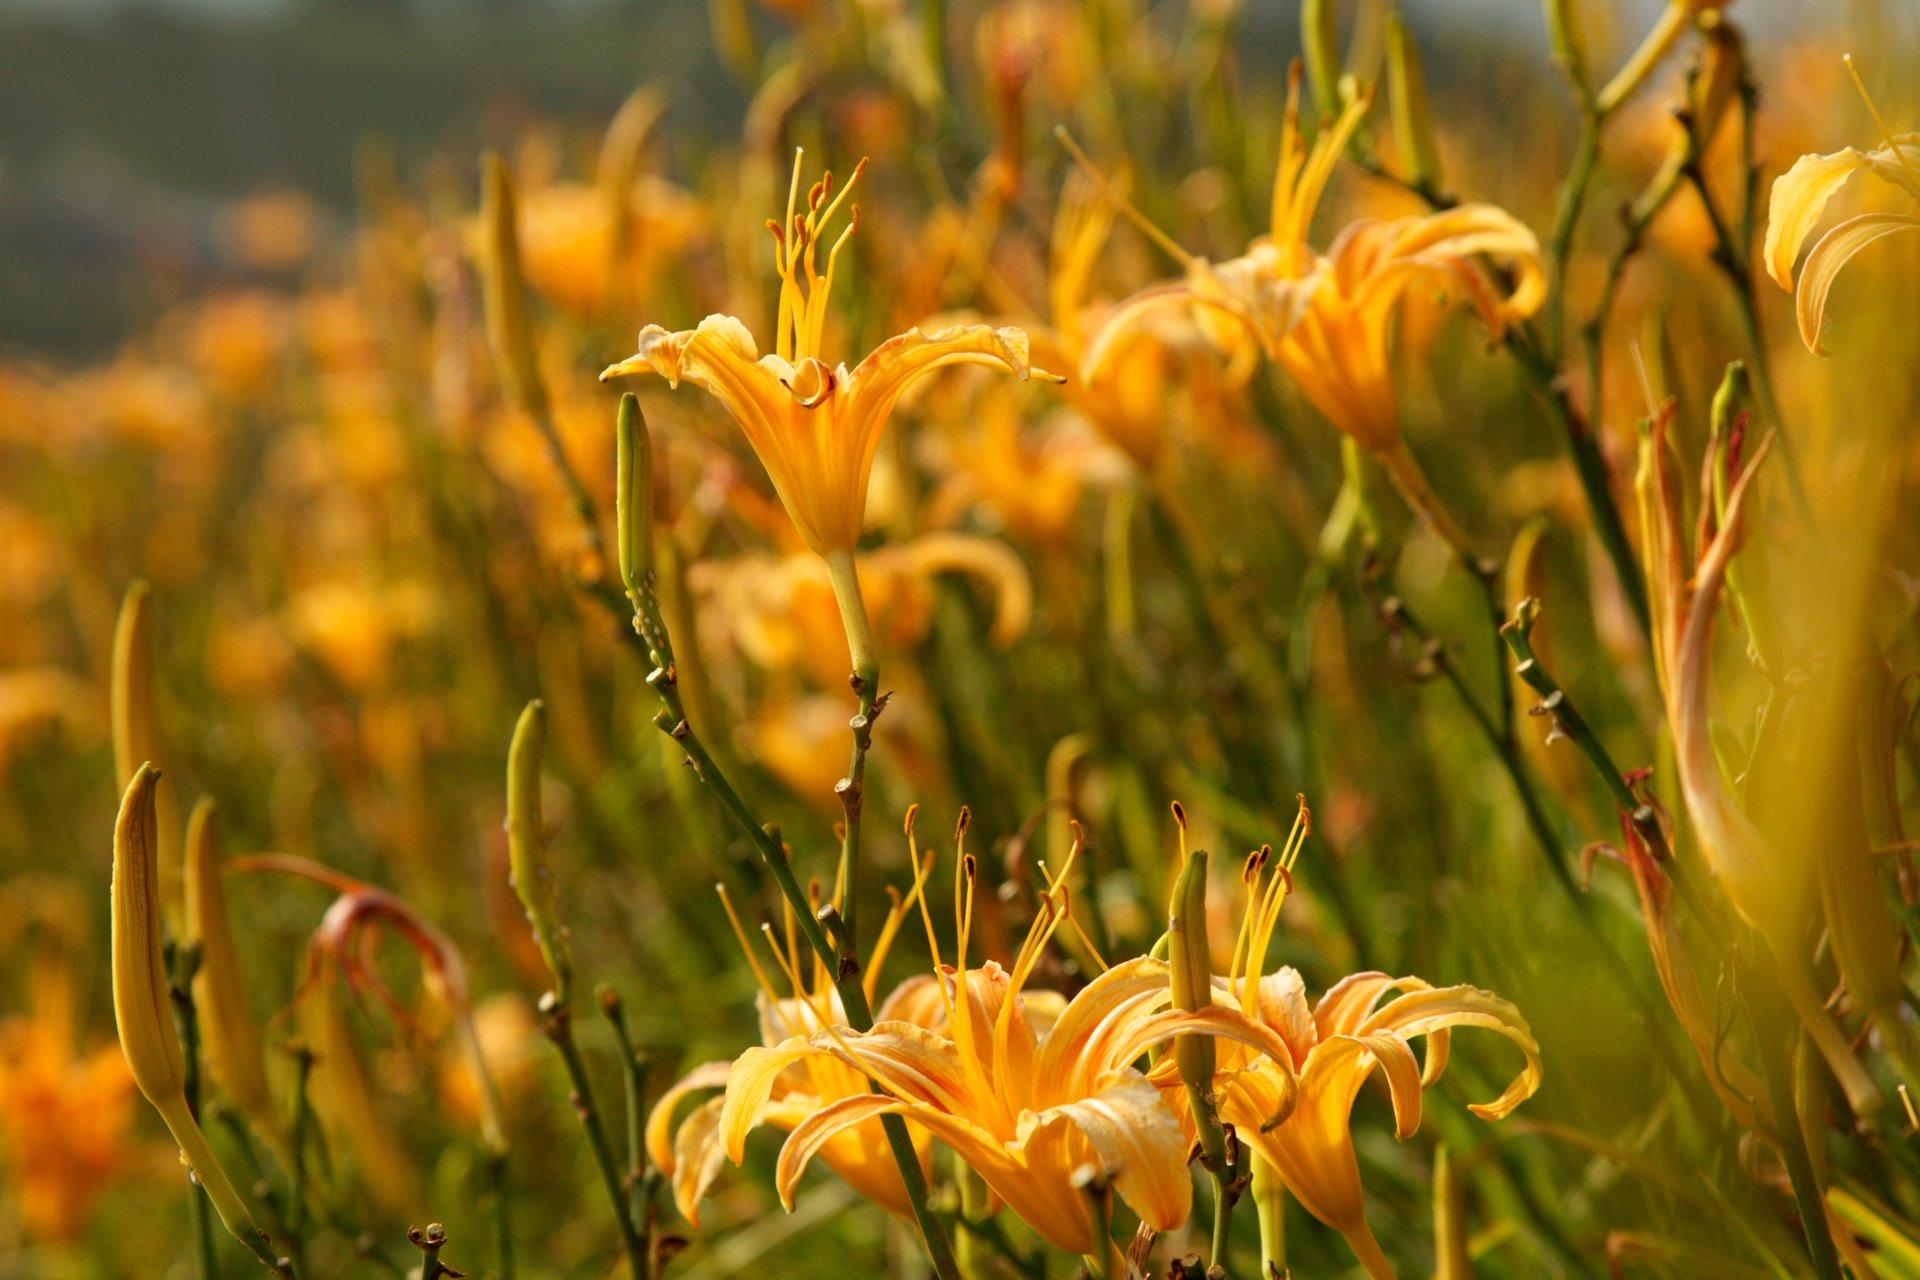 Daylily Blossom in Taiwan - Best Season